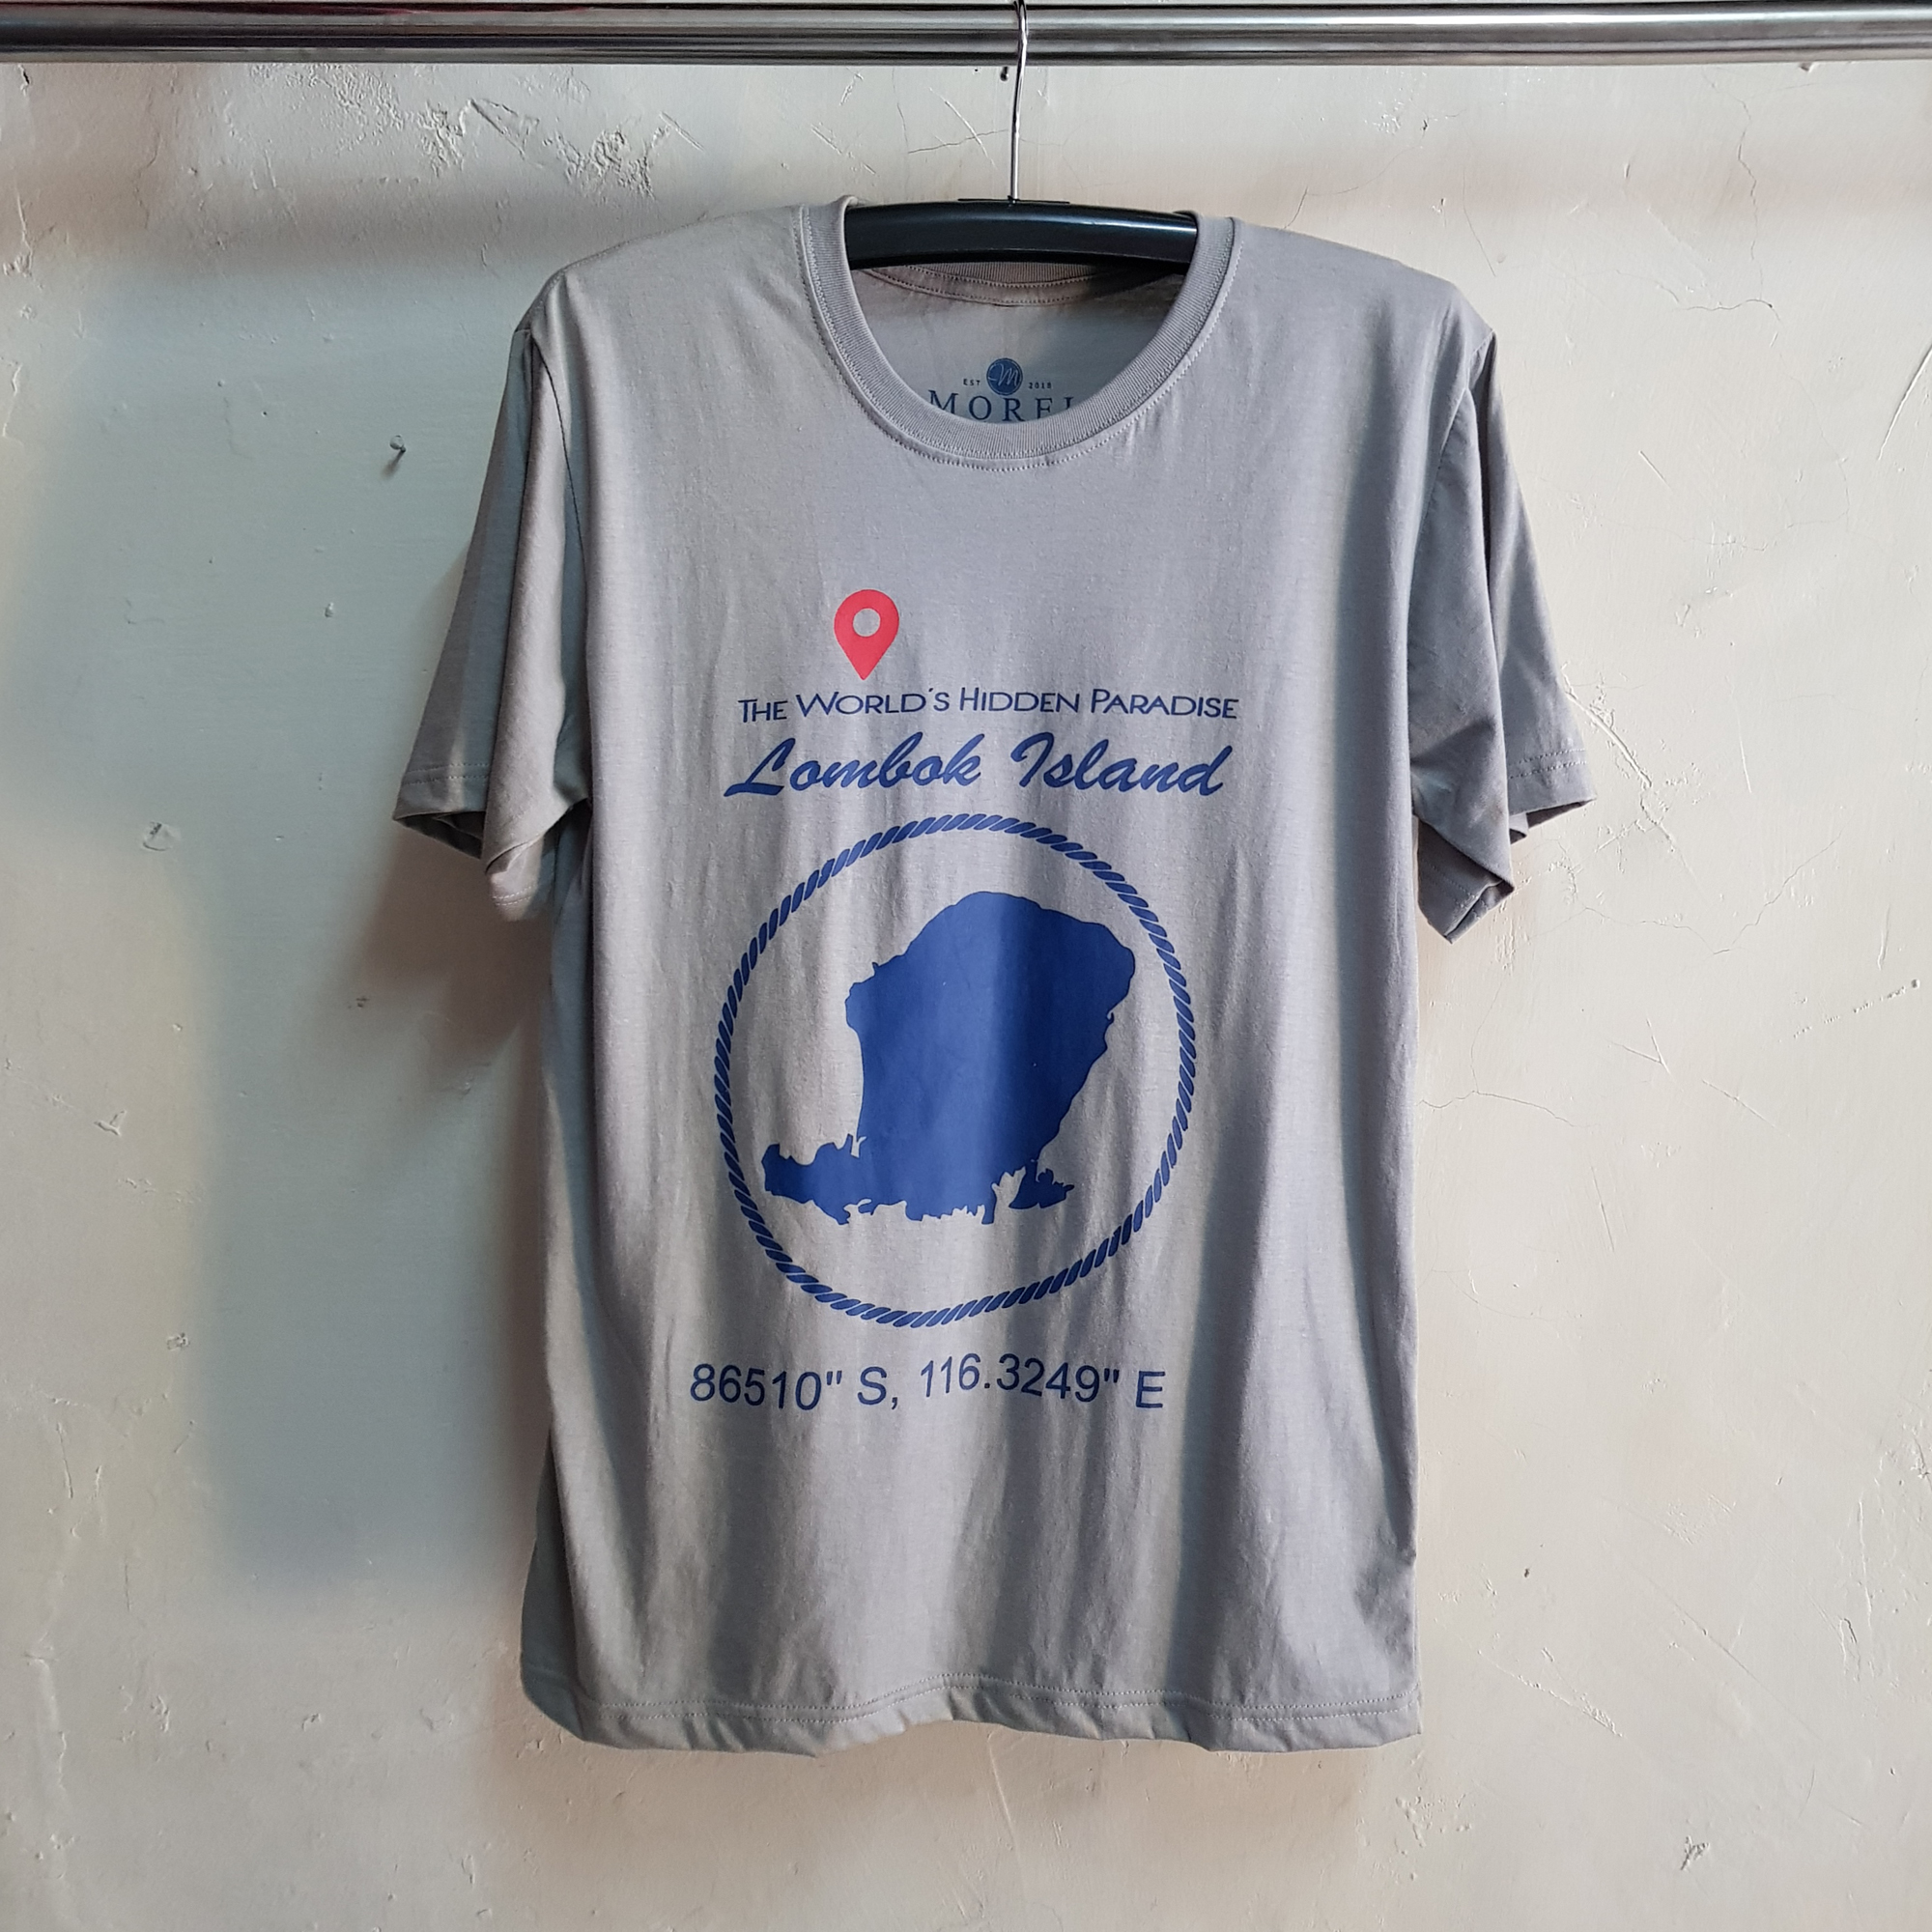 Kaos Oblong Lombok Island, T-Shirt O-Neck